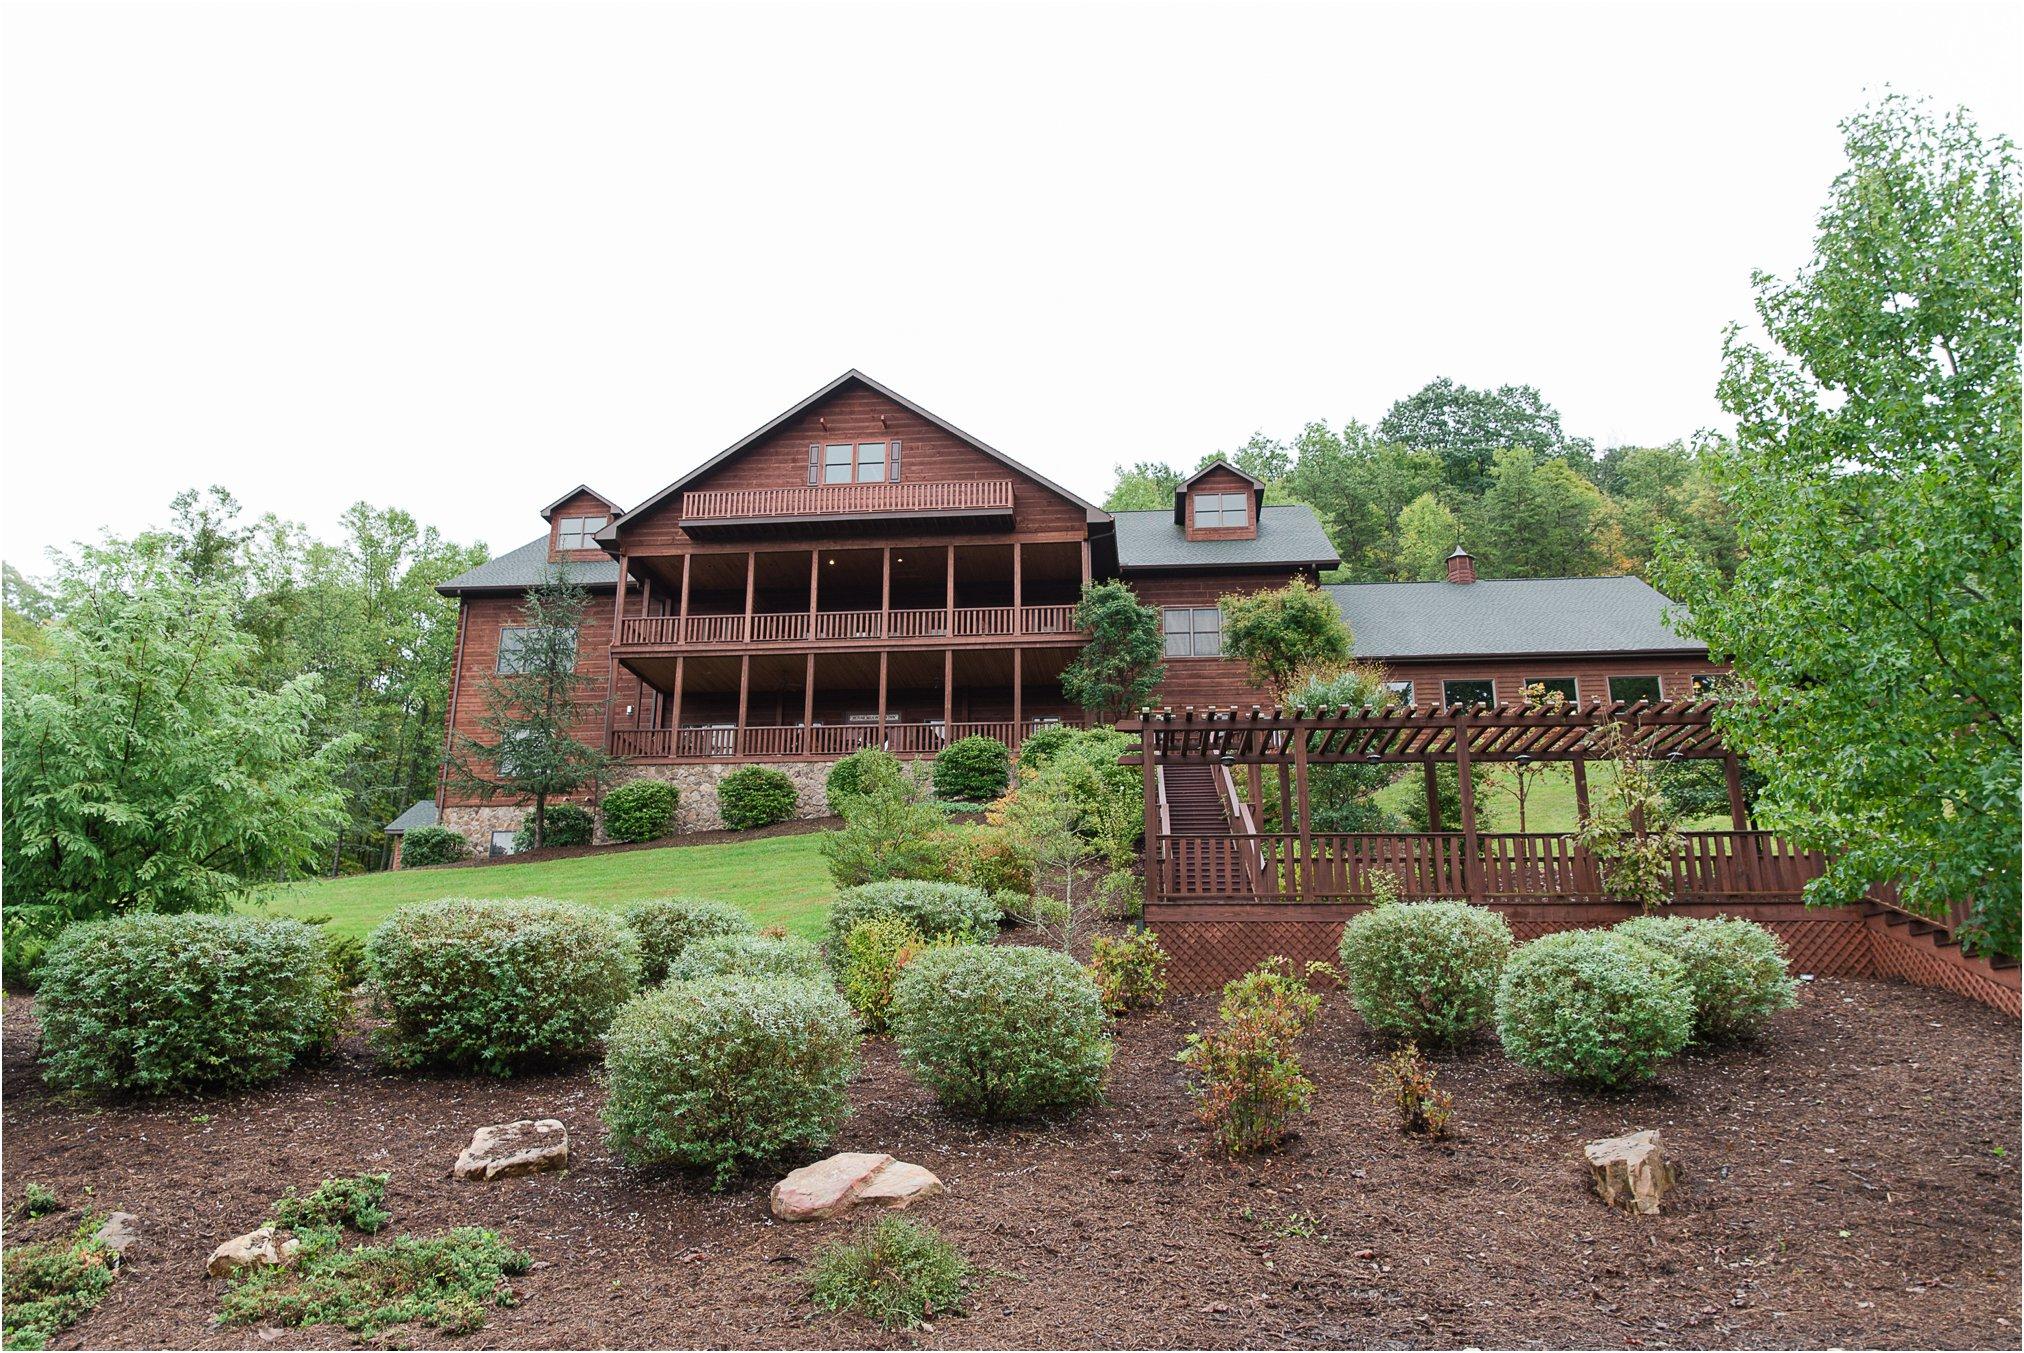 House Mountain Inn Wedding_0560.jpg